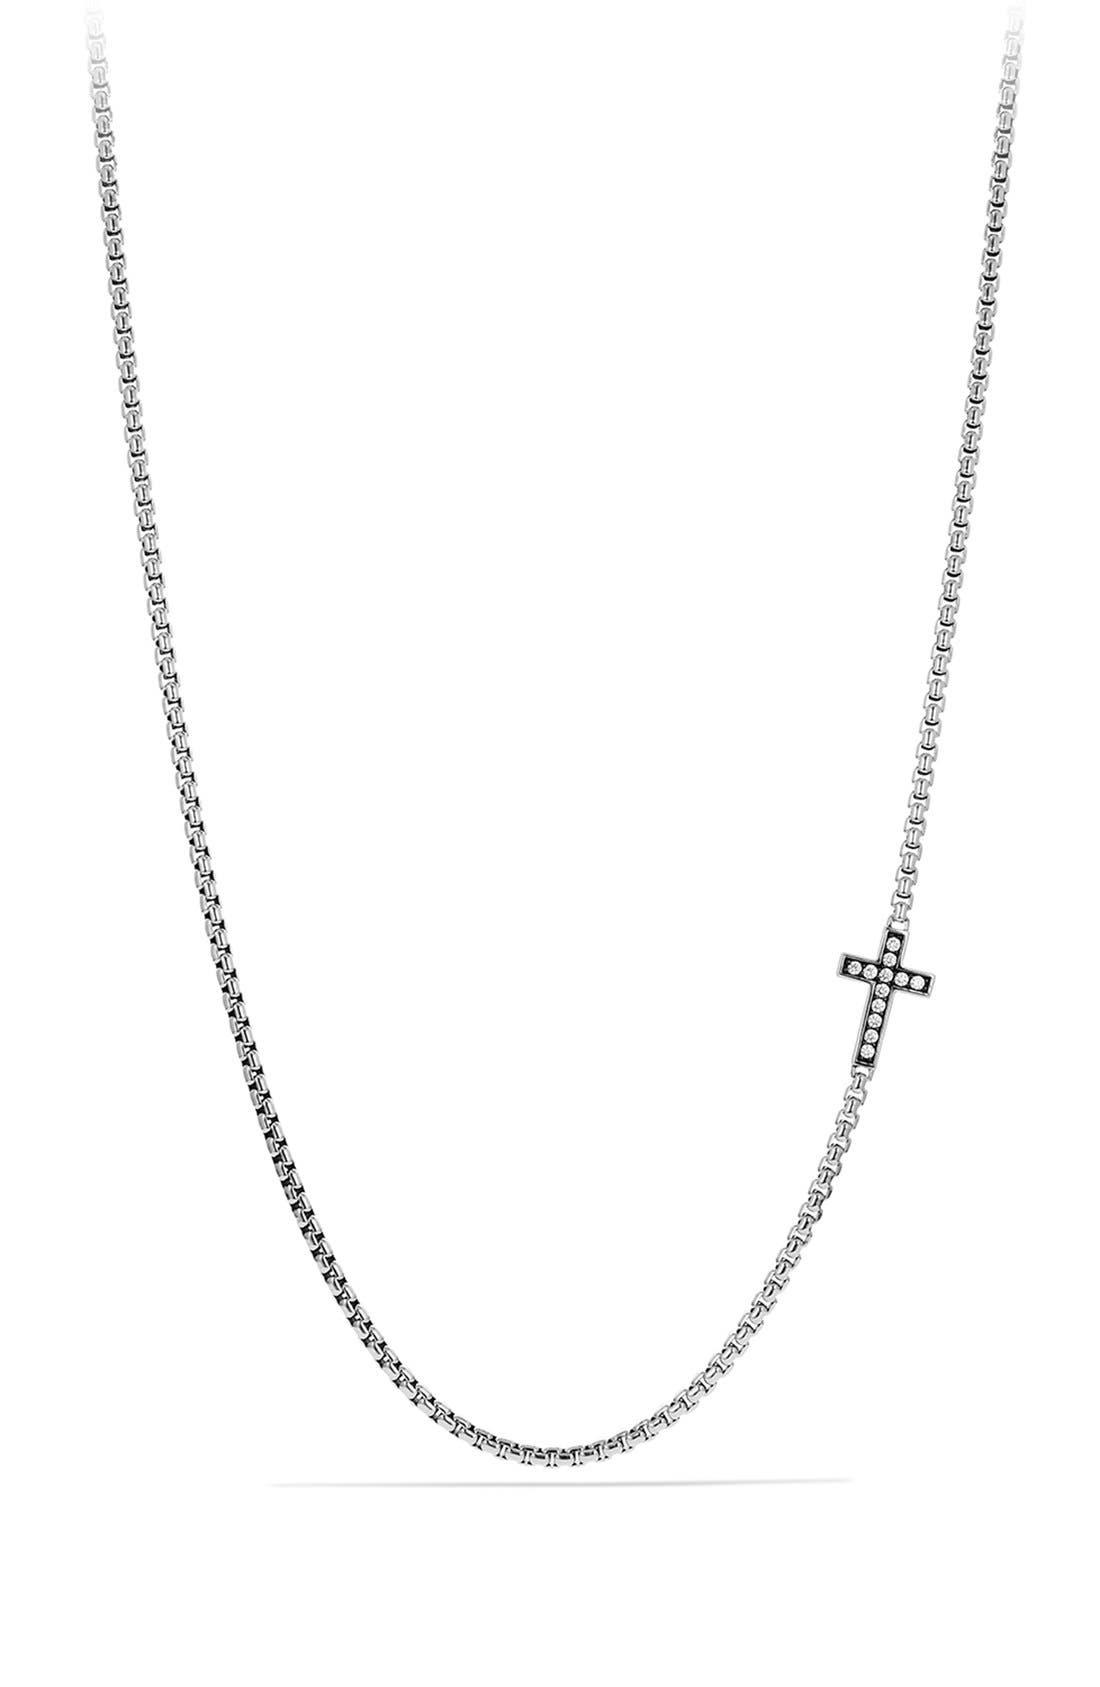 Alternate Image 1 Selected - David Yurman Pavé Cross Necklace with Diamonds